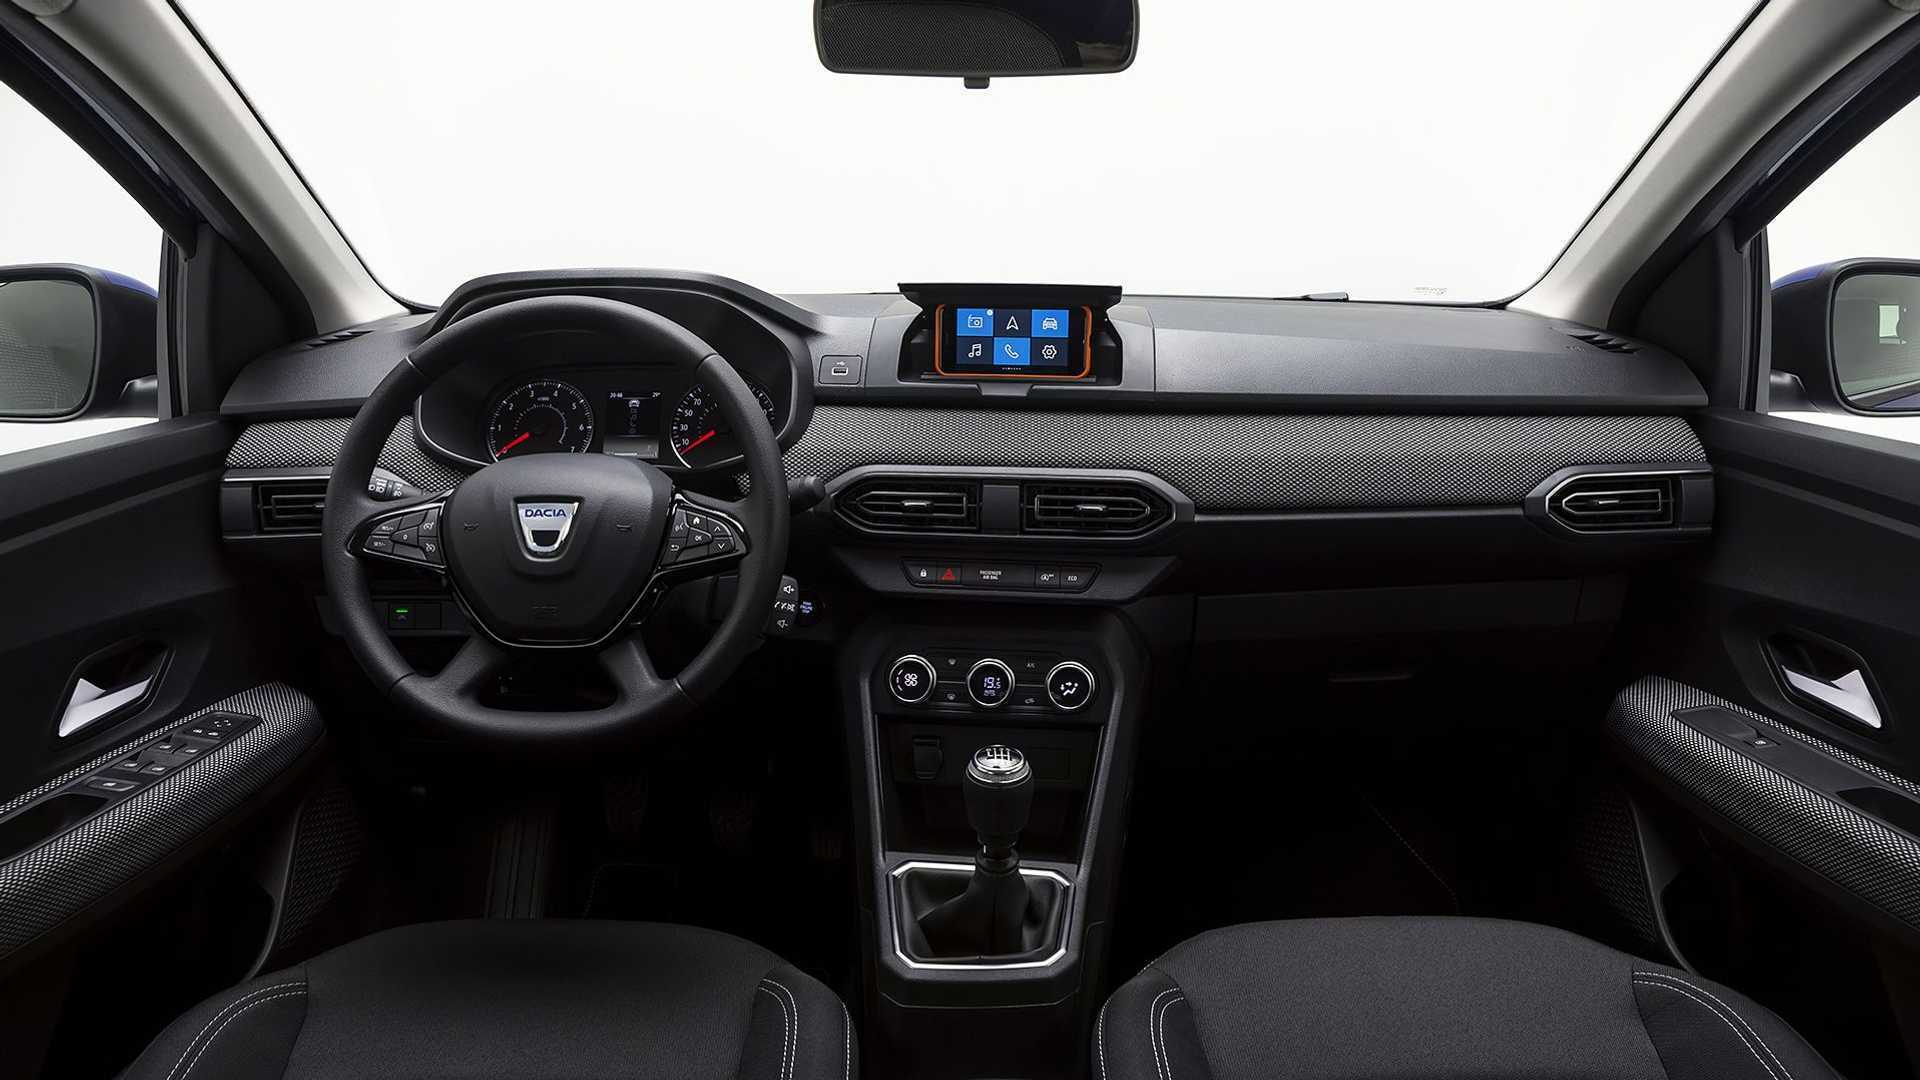 Dacia / Renault Sandero 2021.